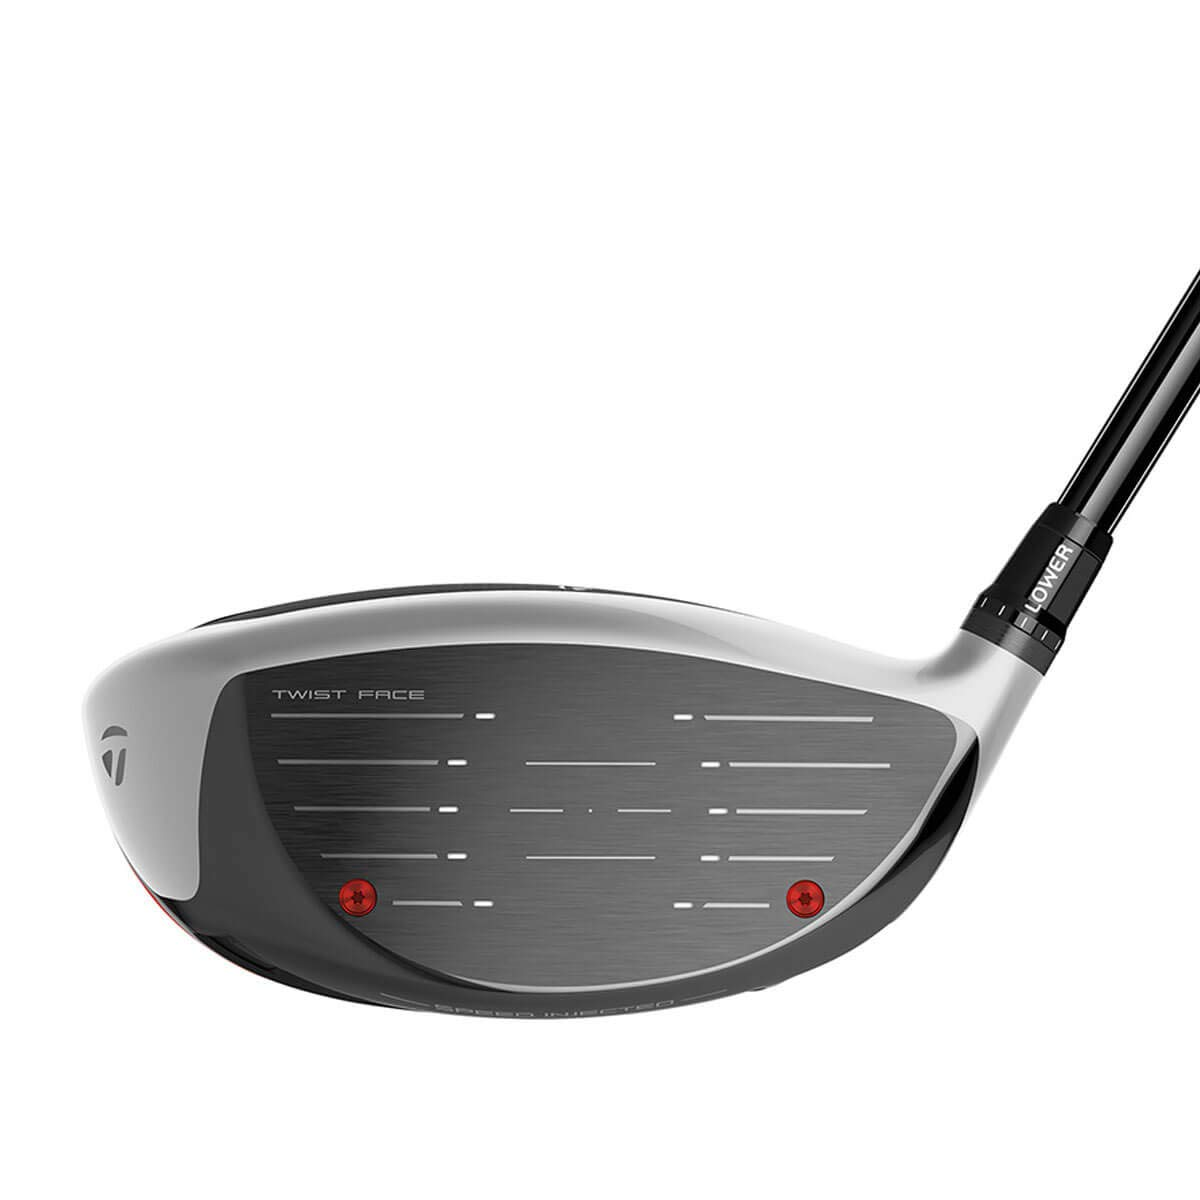 TaylorMade 2019 Golf M6 - Driver de Mano Derecha para Hombre ...